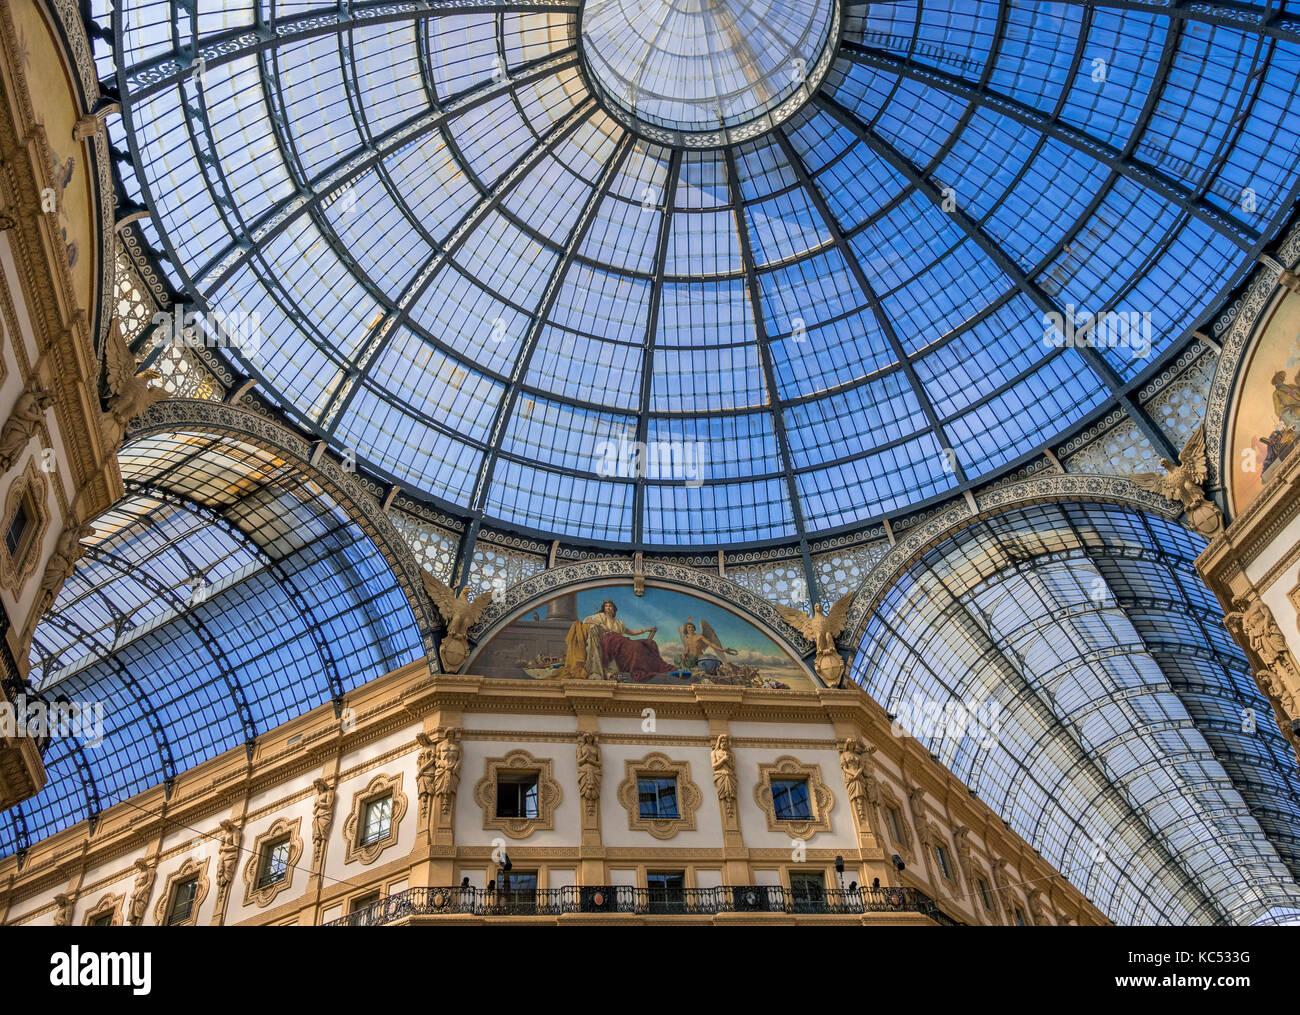 Galleria Vittorio Emanuele II, gallery, Milano, Milan, Lombardy, Lombardy, Italy, Europe - Stock Image